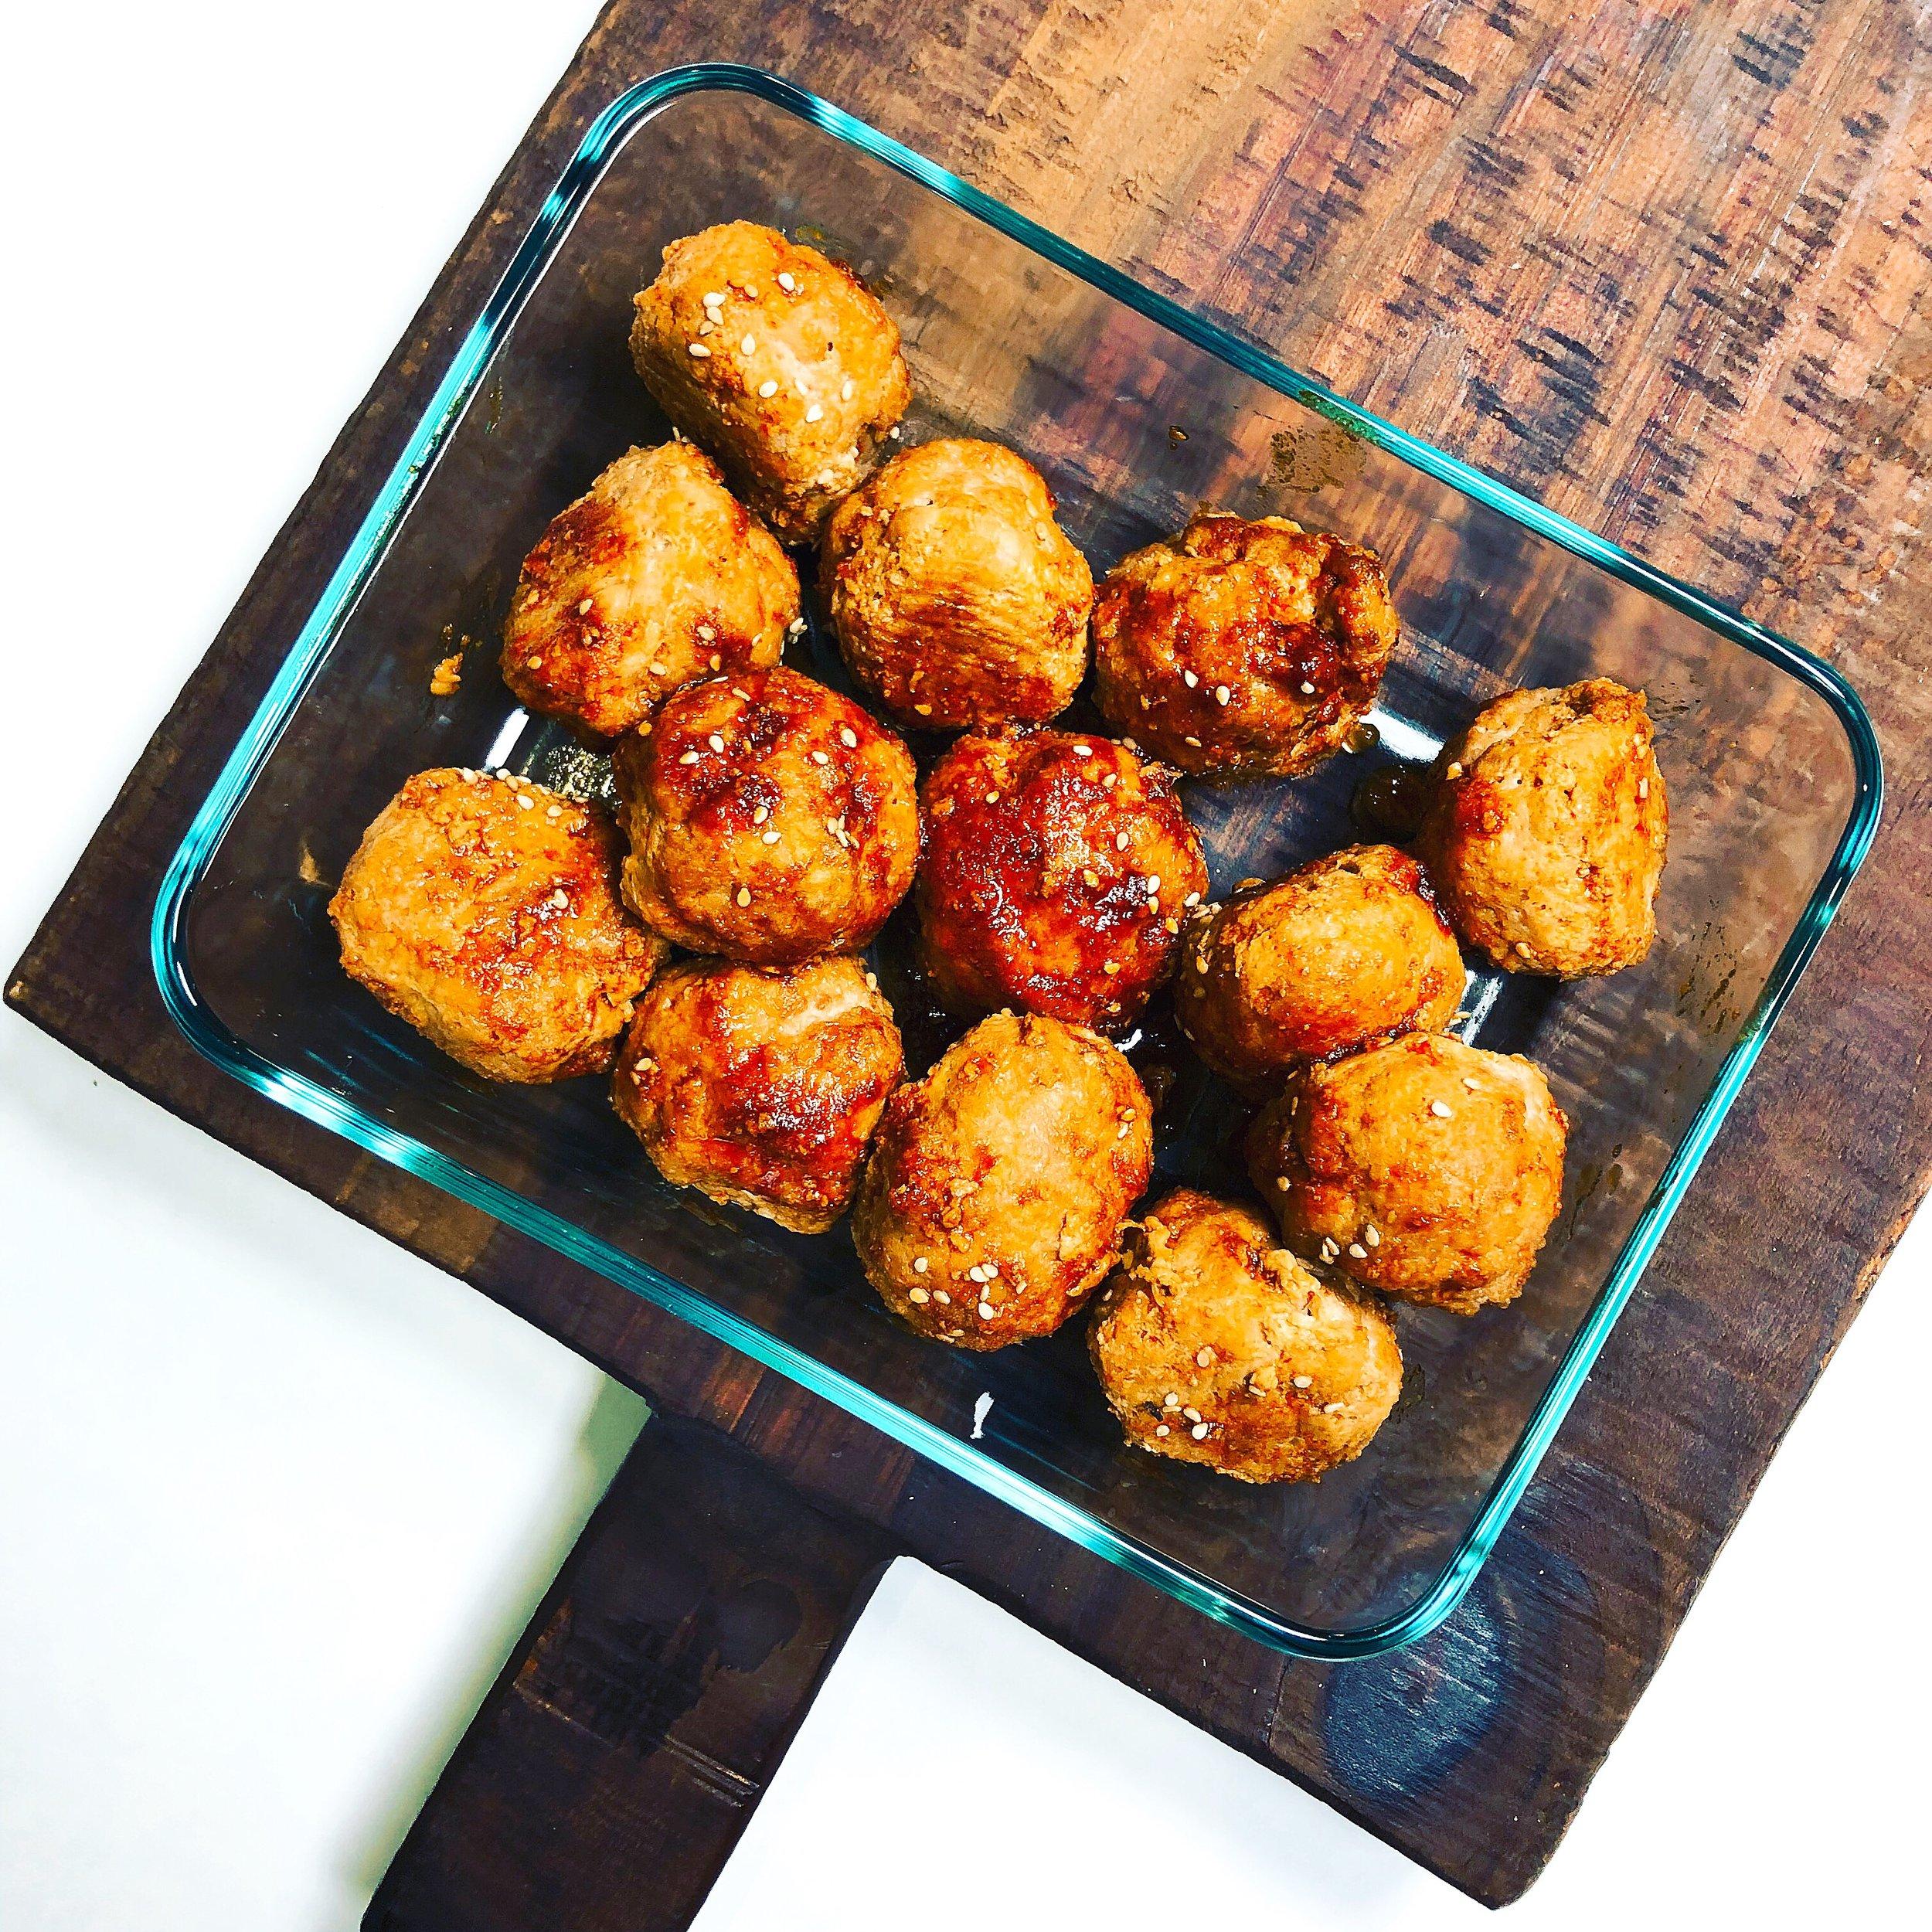 These meatballs reheat beautifully.